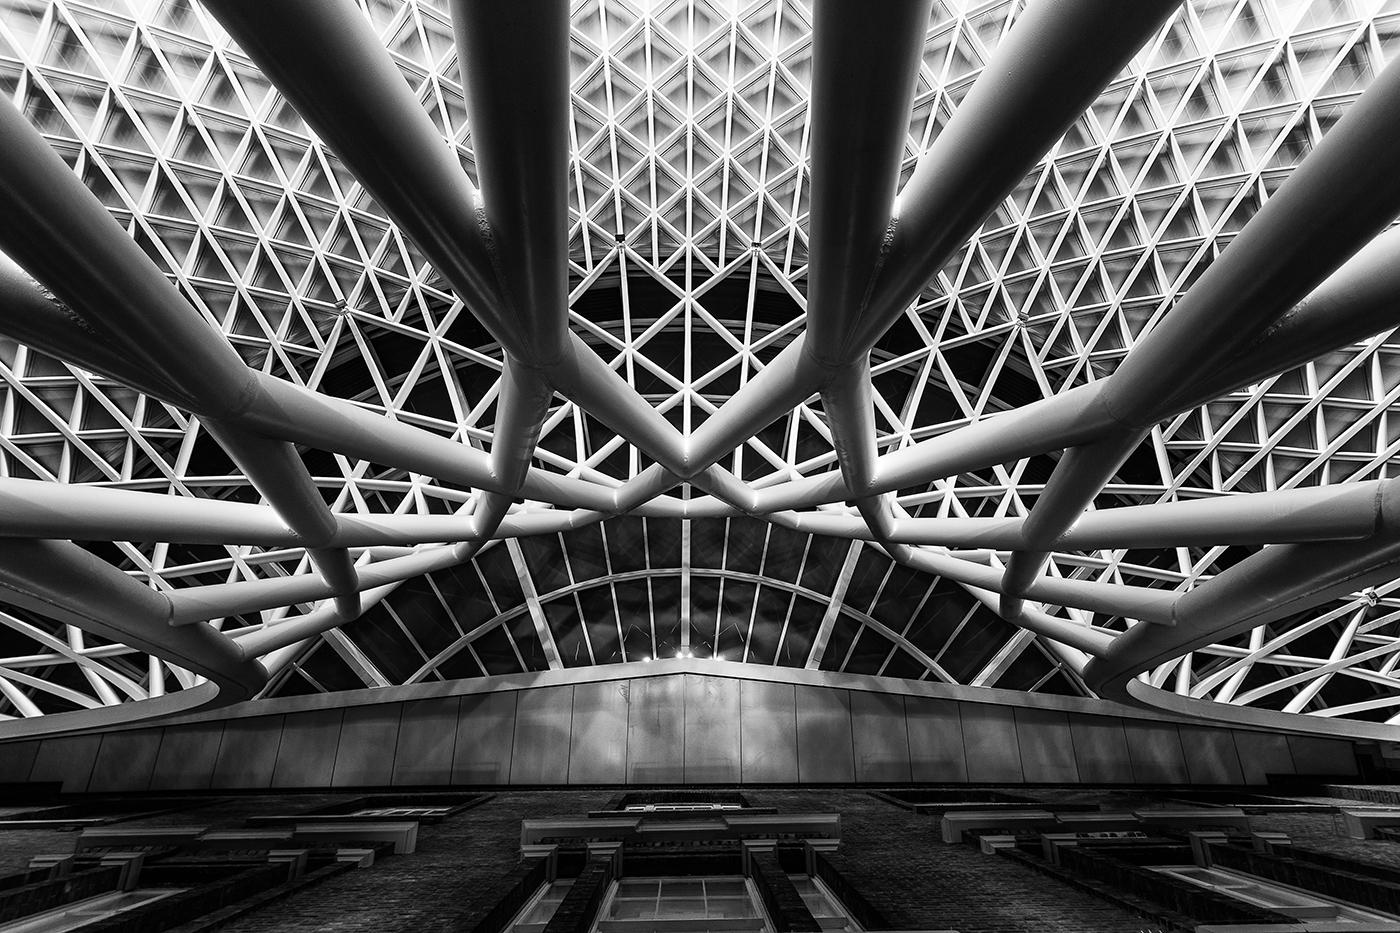 King's Cross Concourse